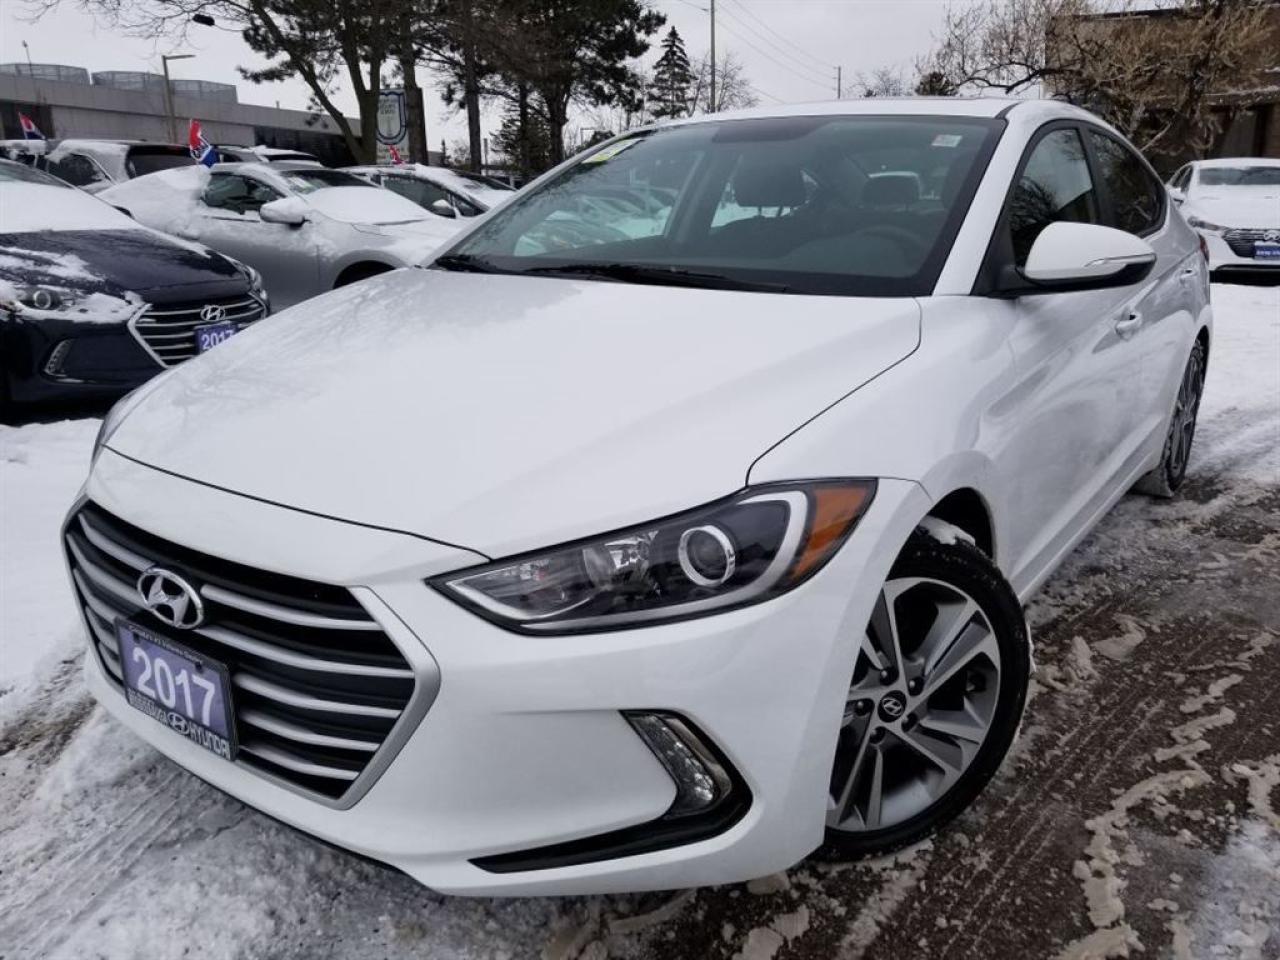 2017 Hyundai Elantra GLS-Apple Auto-blind spot detection